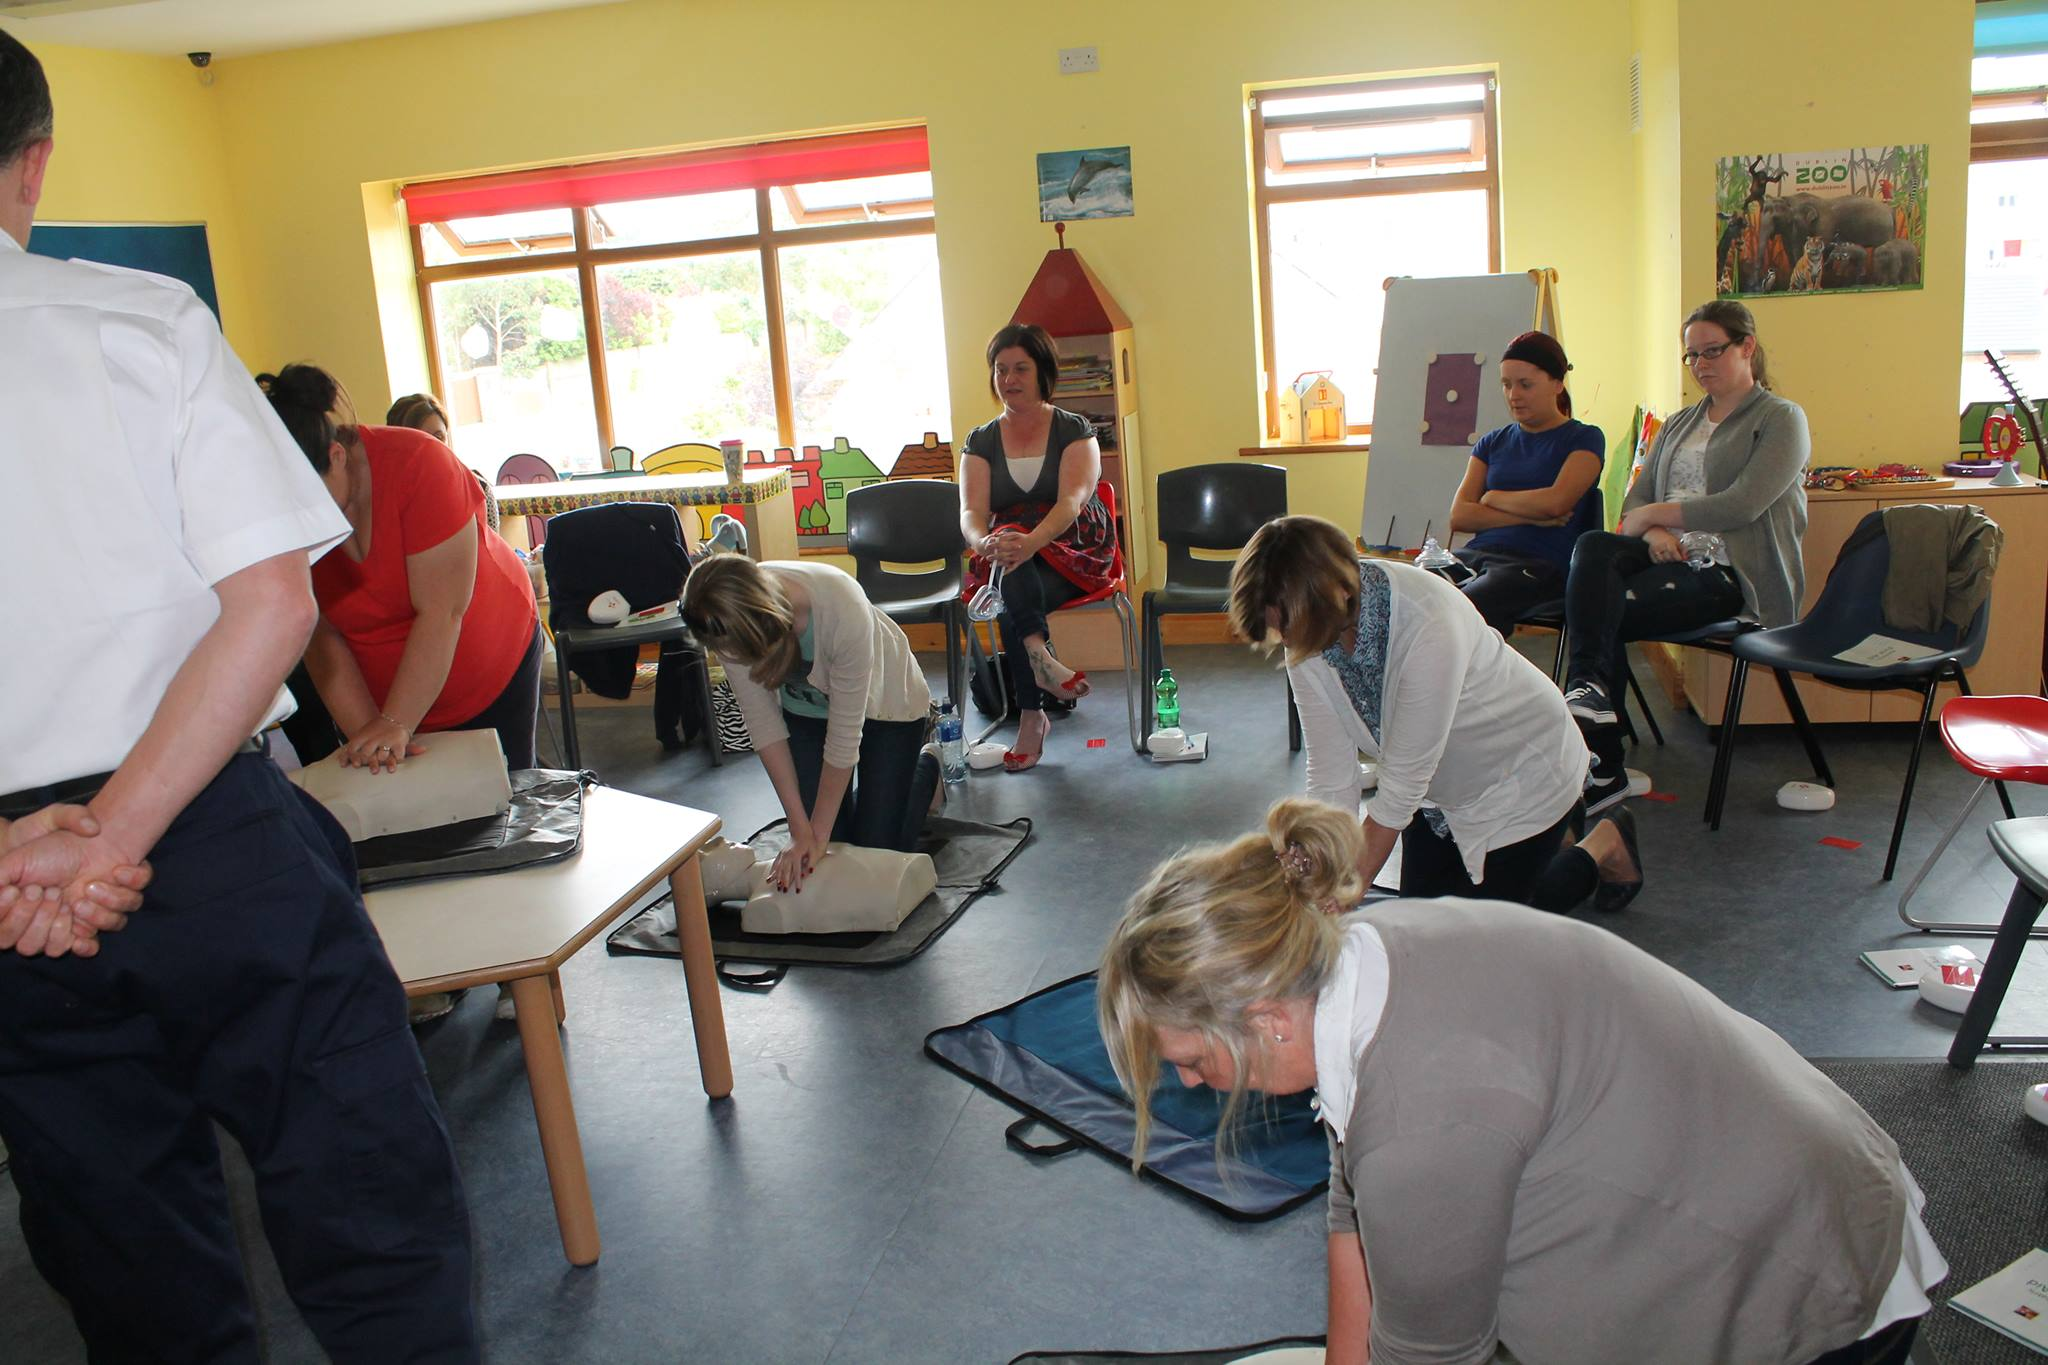 DX2 Training Solutions - Dublin Positively